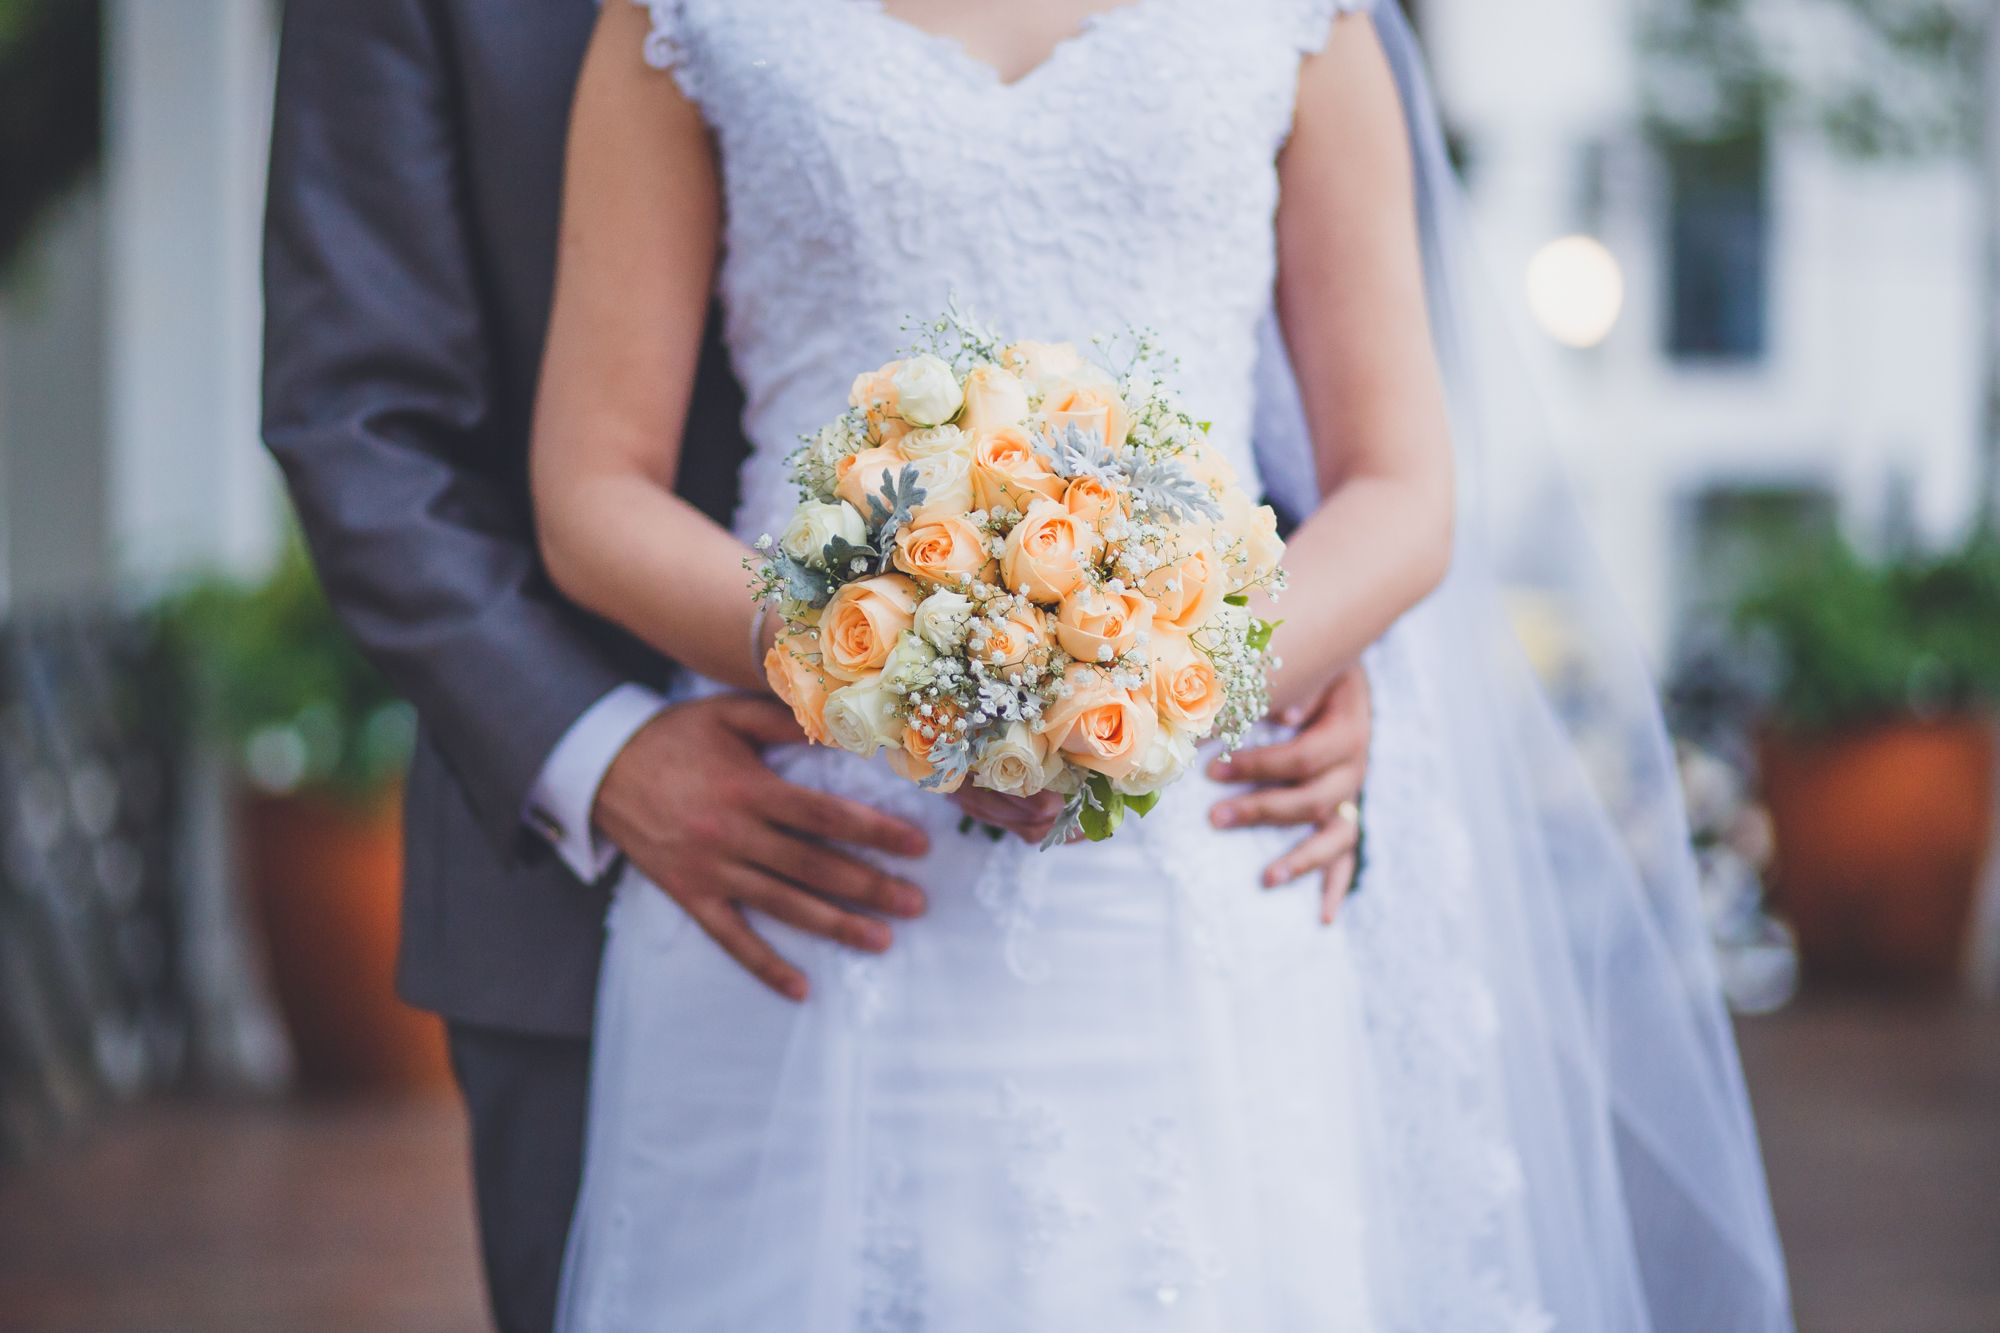 Casamento - Alessandra & Renato - Curitiba - http://danistarck.com/2016/11/21/casamento-alessandra-renato/